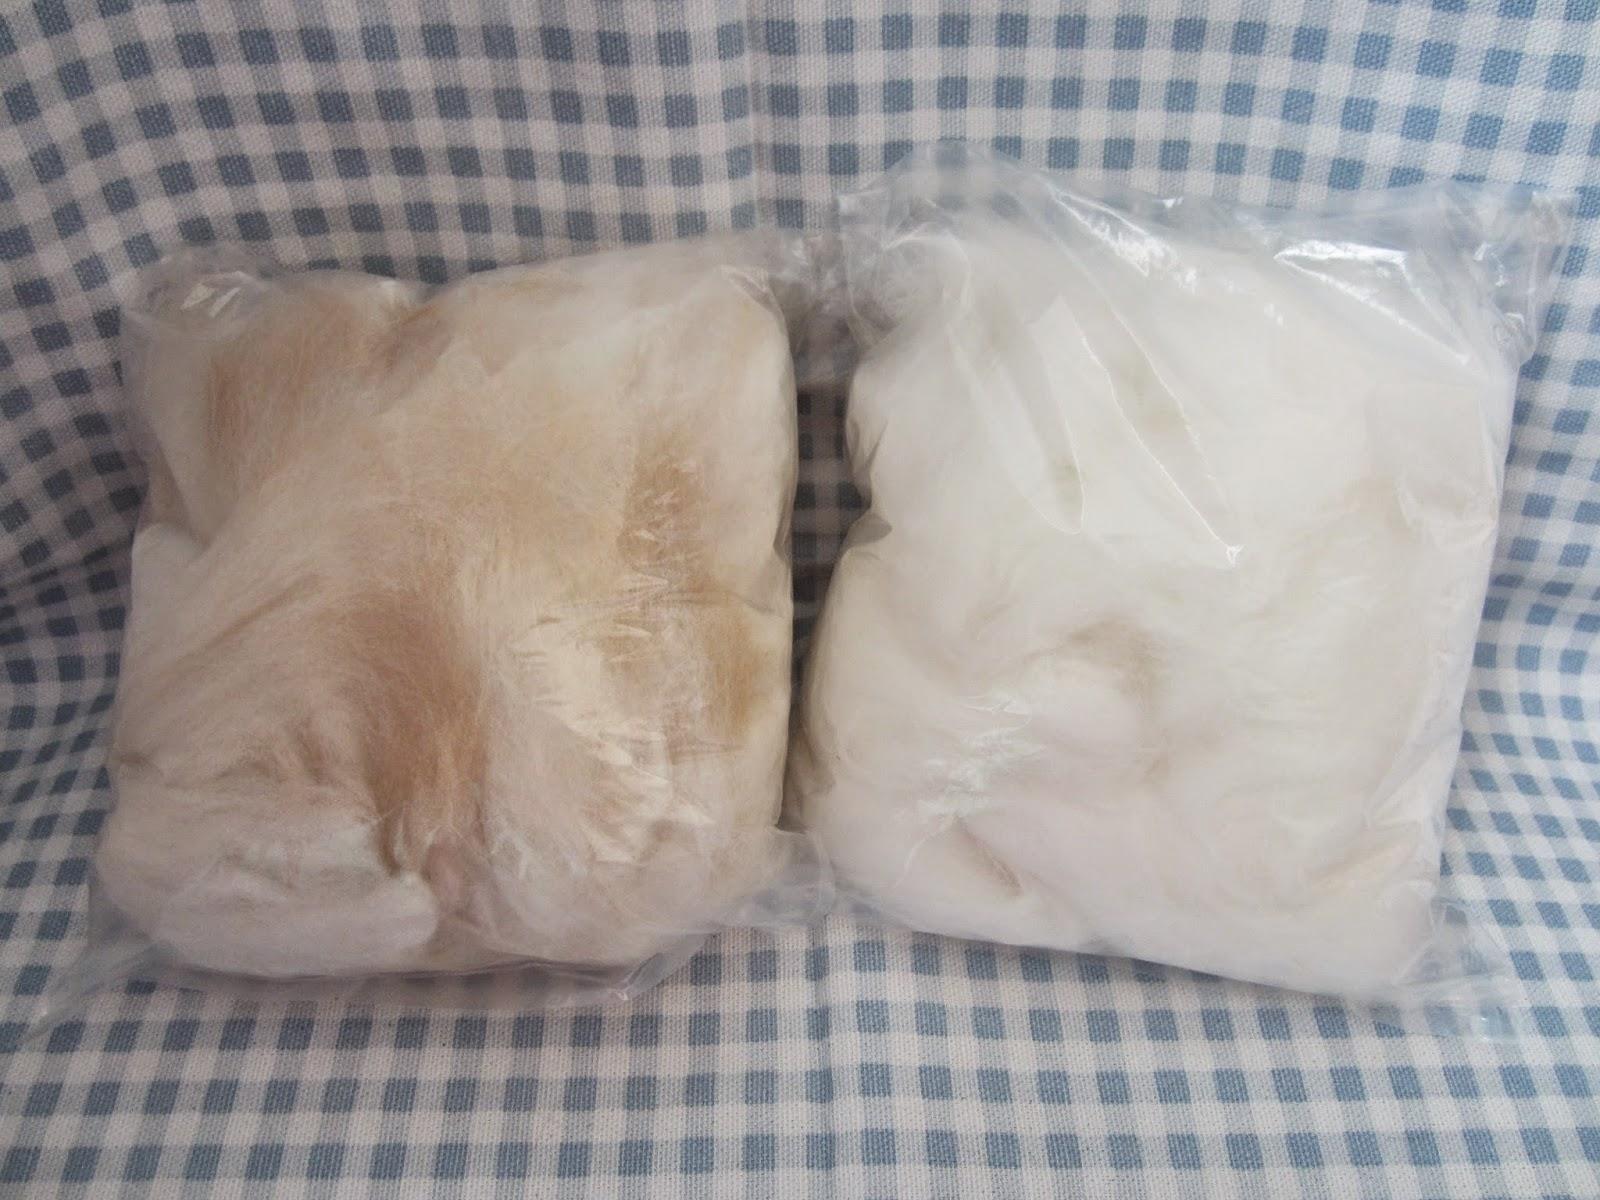 https://www.etsy.com/listing/211106619/cloud-soft-purebred-french-angora-fiber?ref=shop_home_active_2